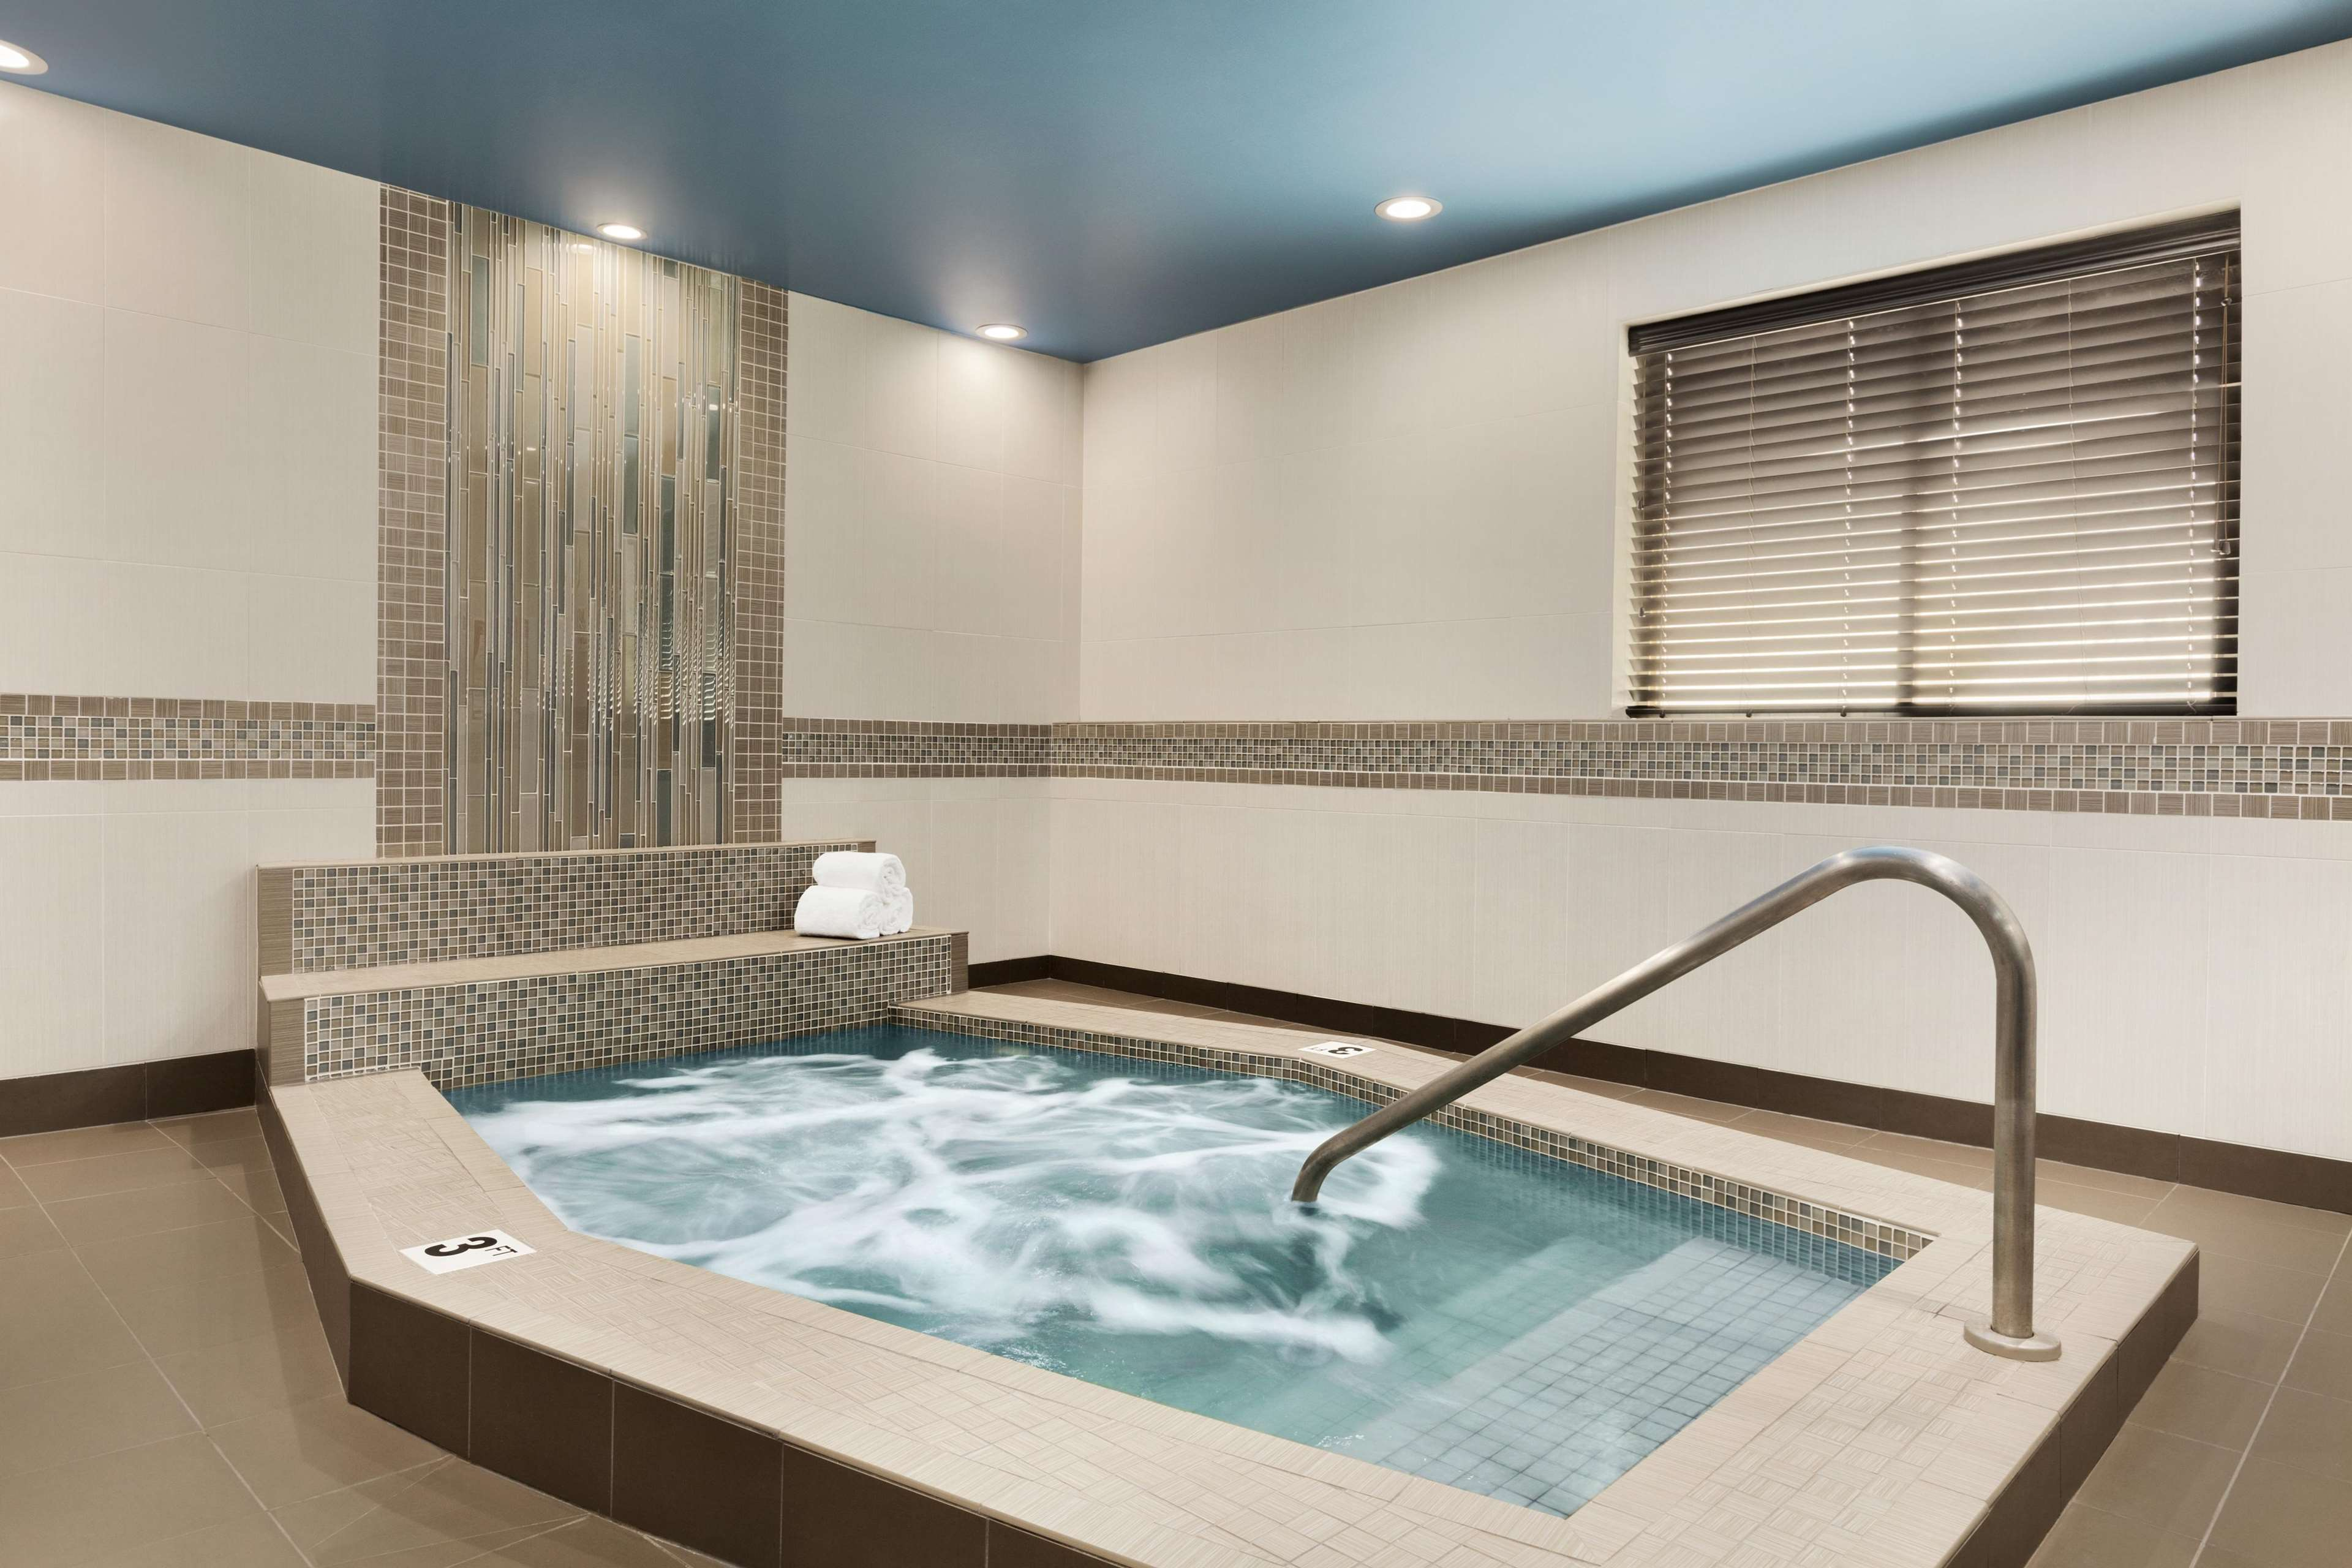 hampton inn portland clackamas in clackamas or hotels. Black Bedroom Furniture Sets. Home Design Ideas